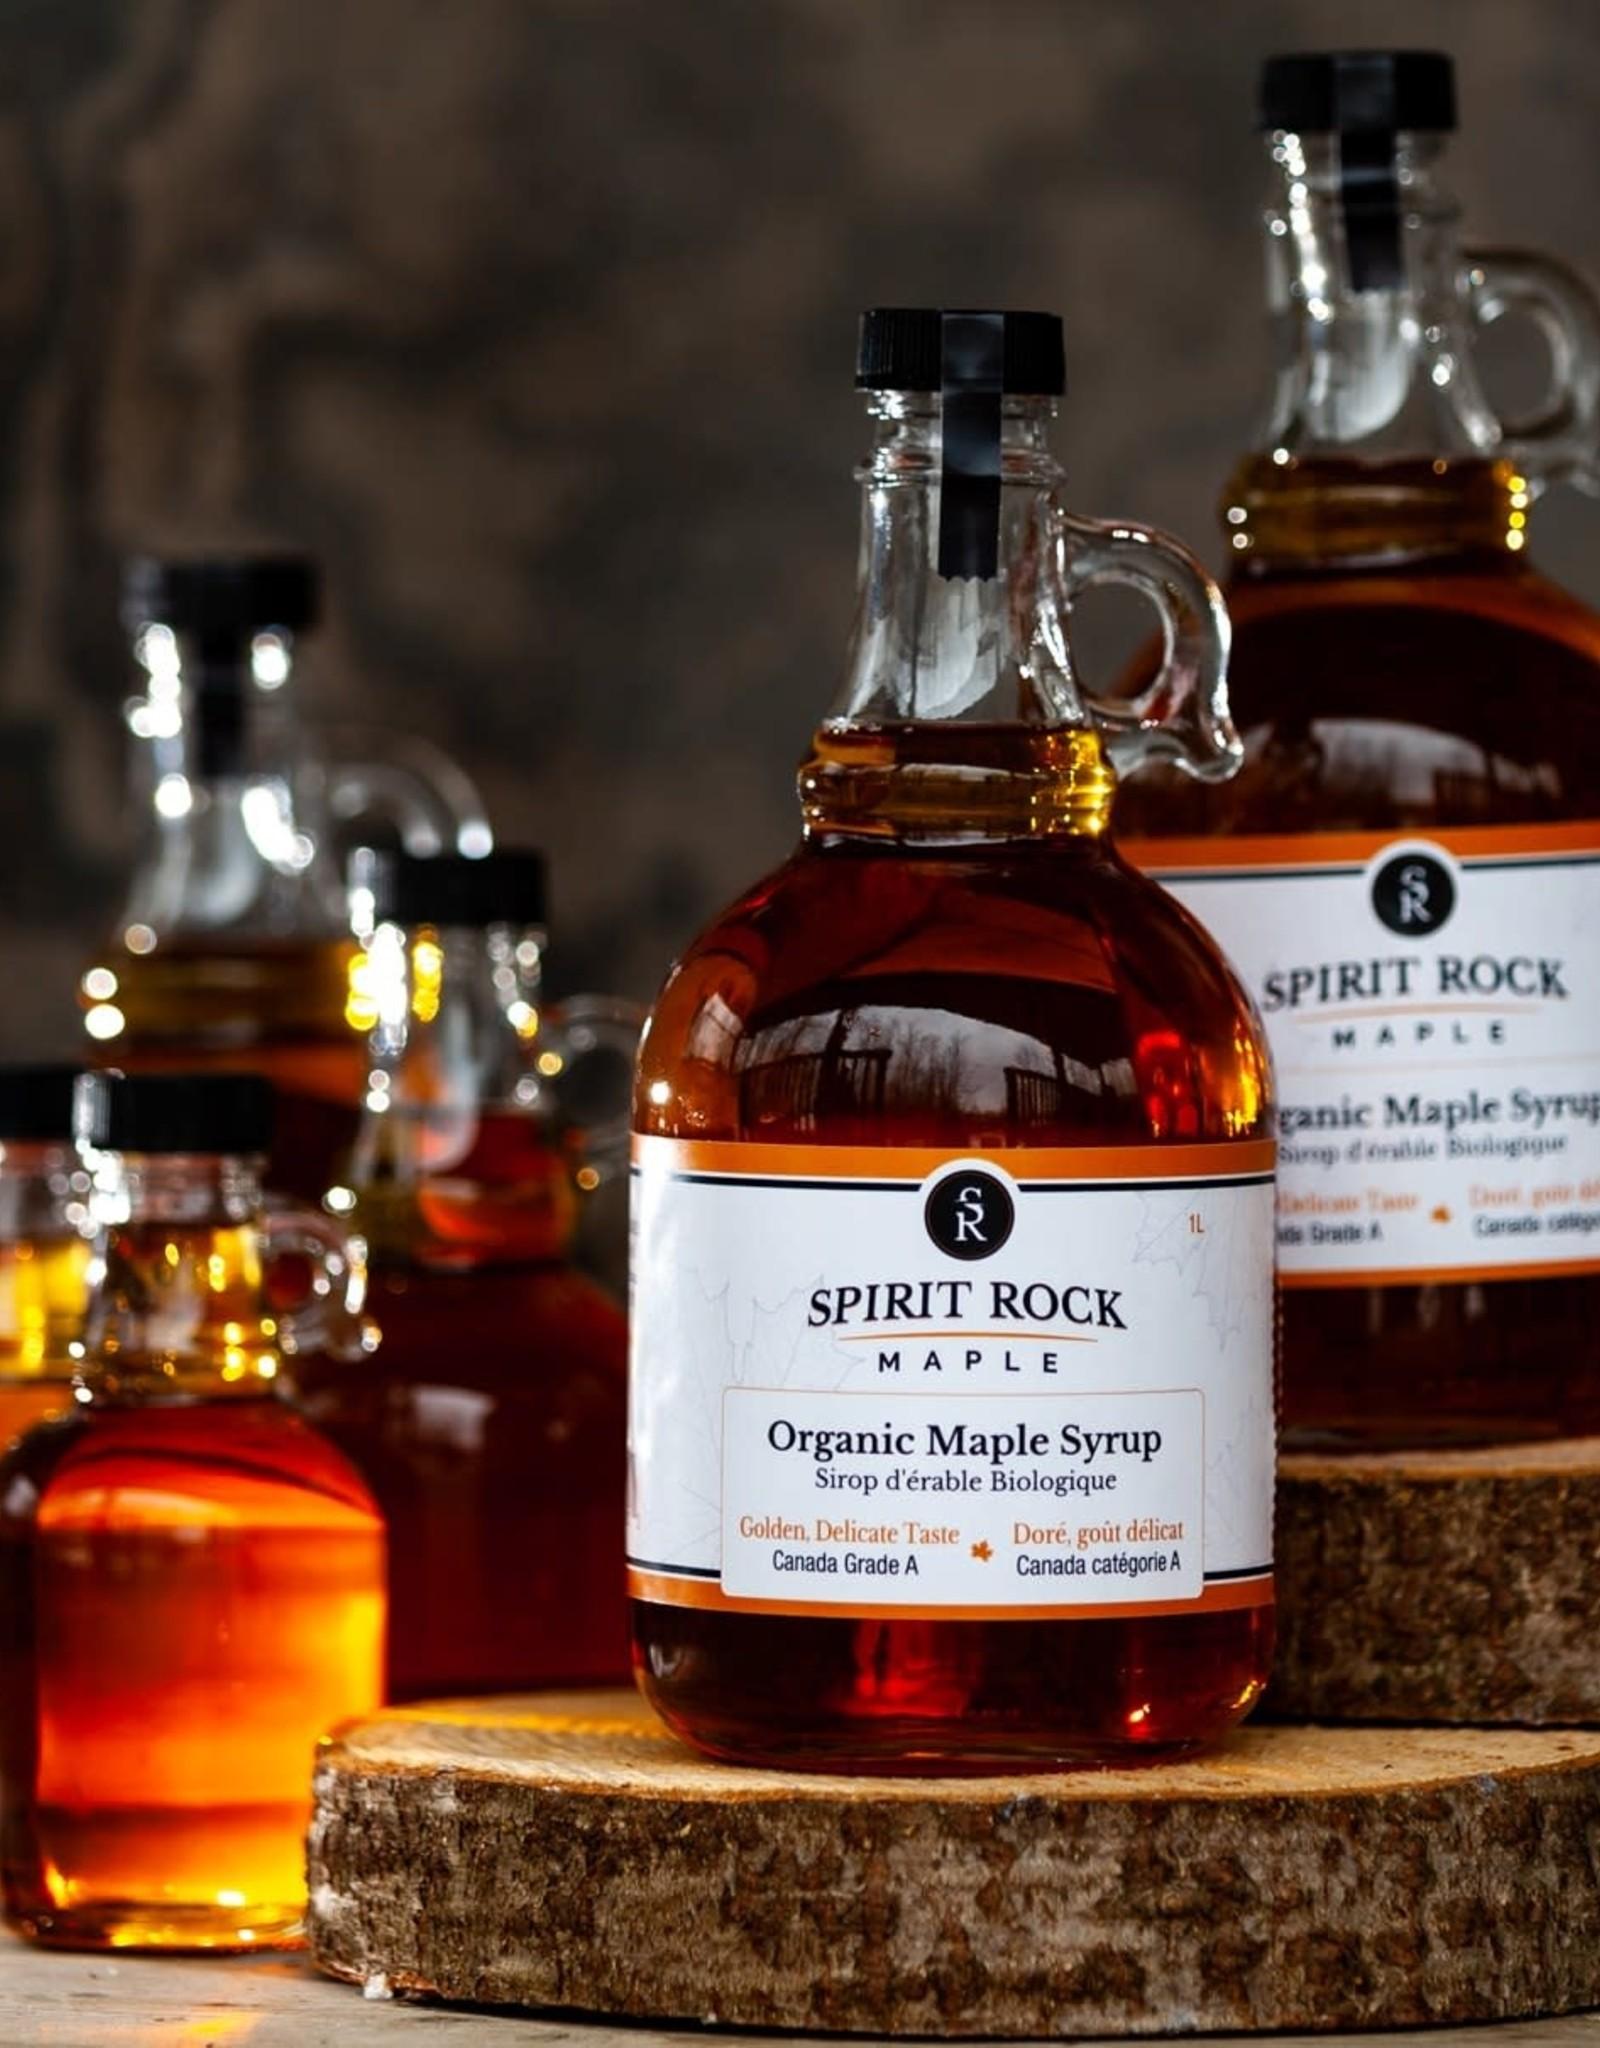 Spirit Rock Maple Organic Maple Syrup 250 ml